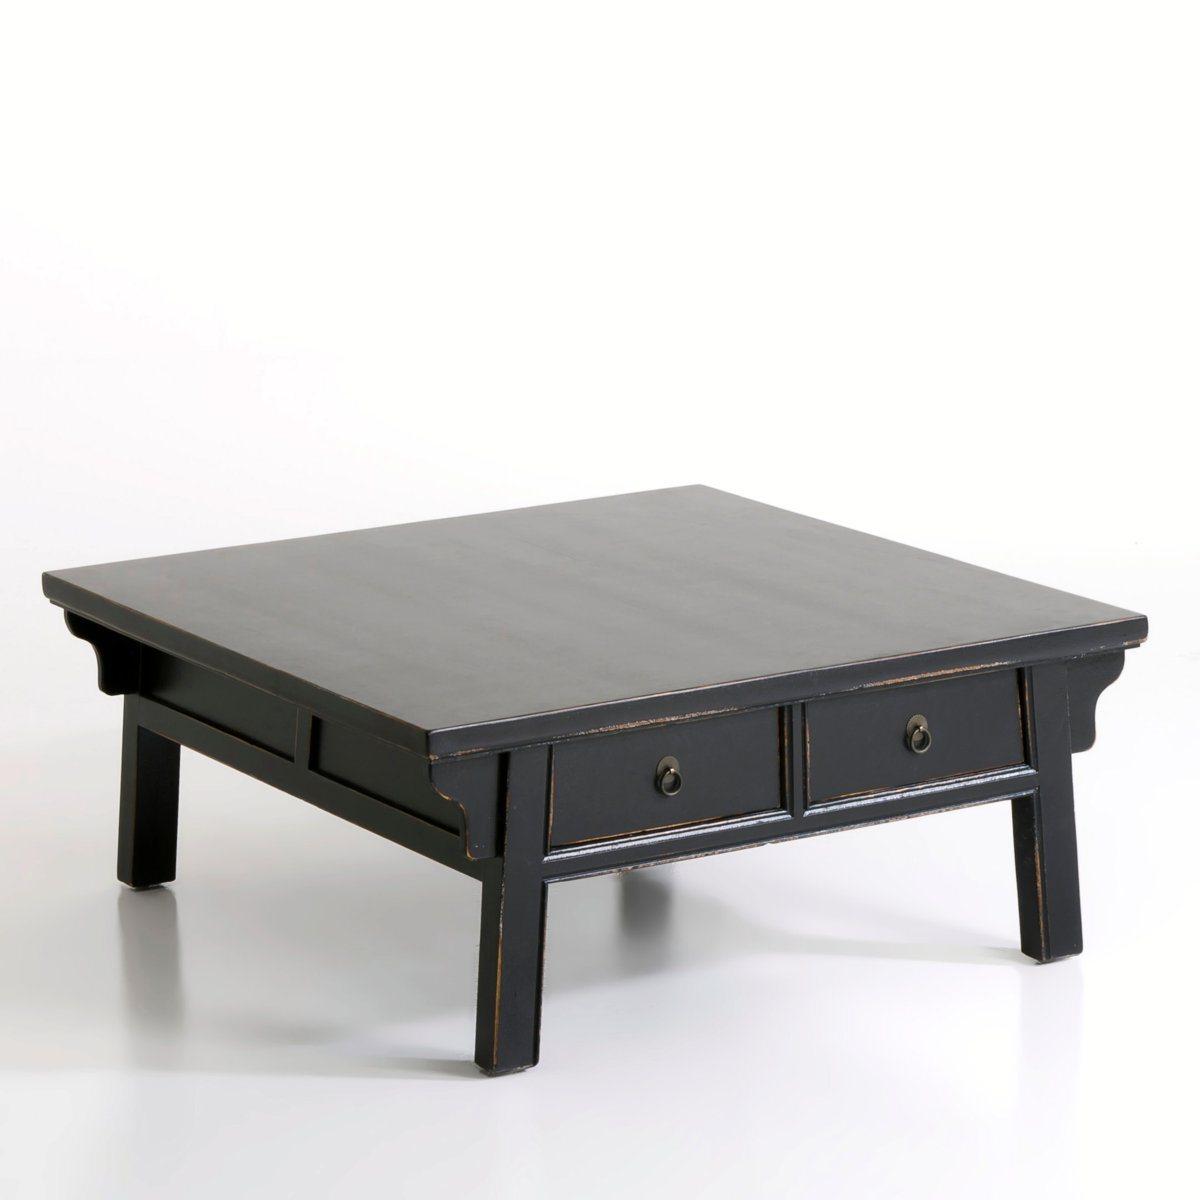 Table Basse AM PM - Table basse Limei bois Am.Pm - Iziva.com